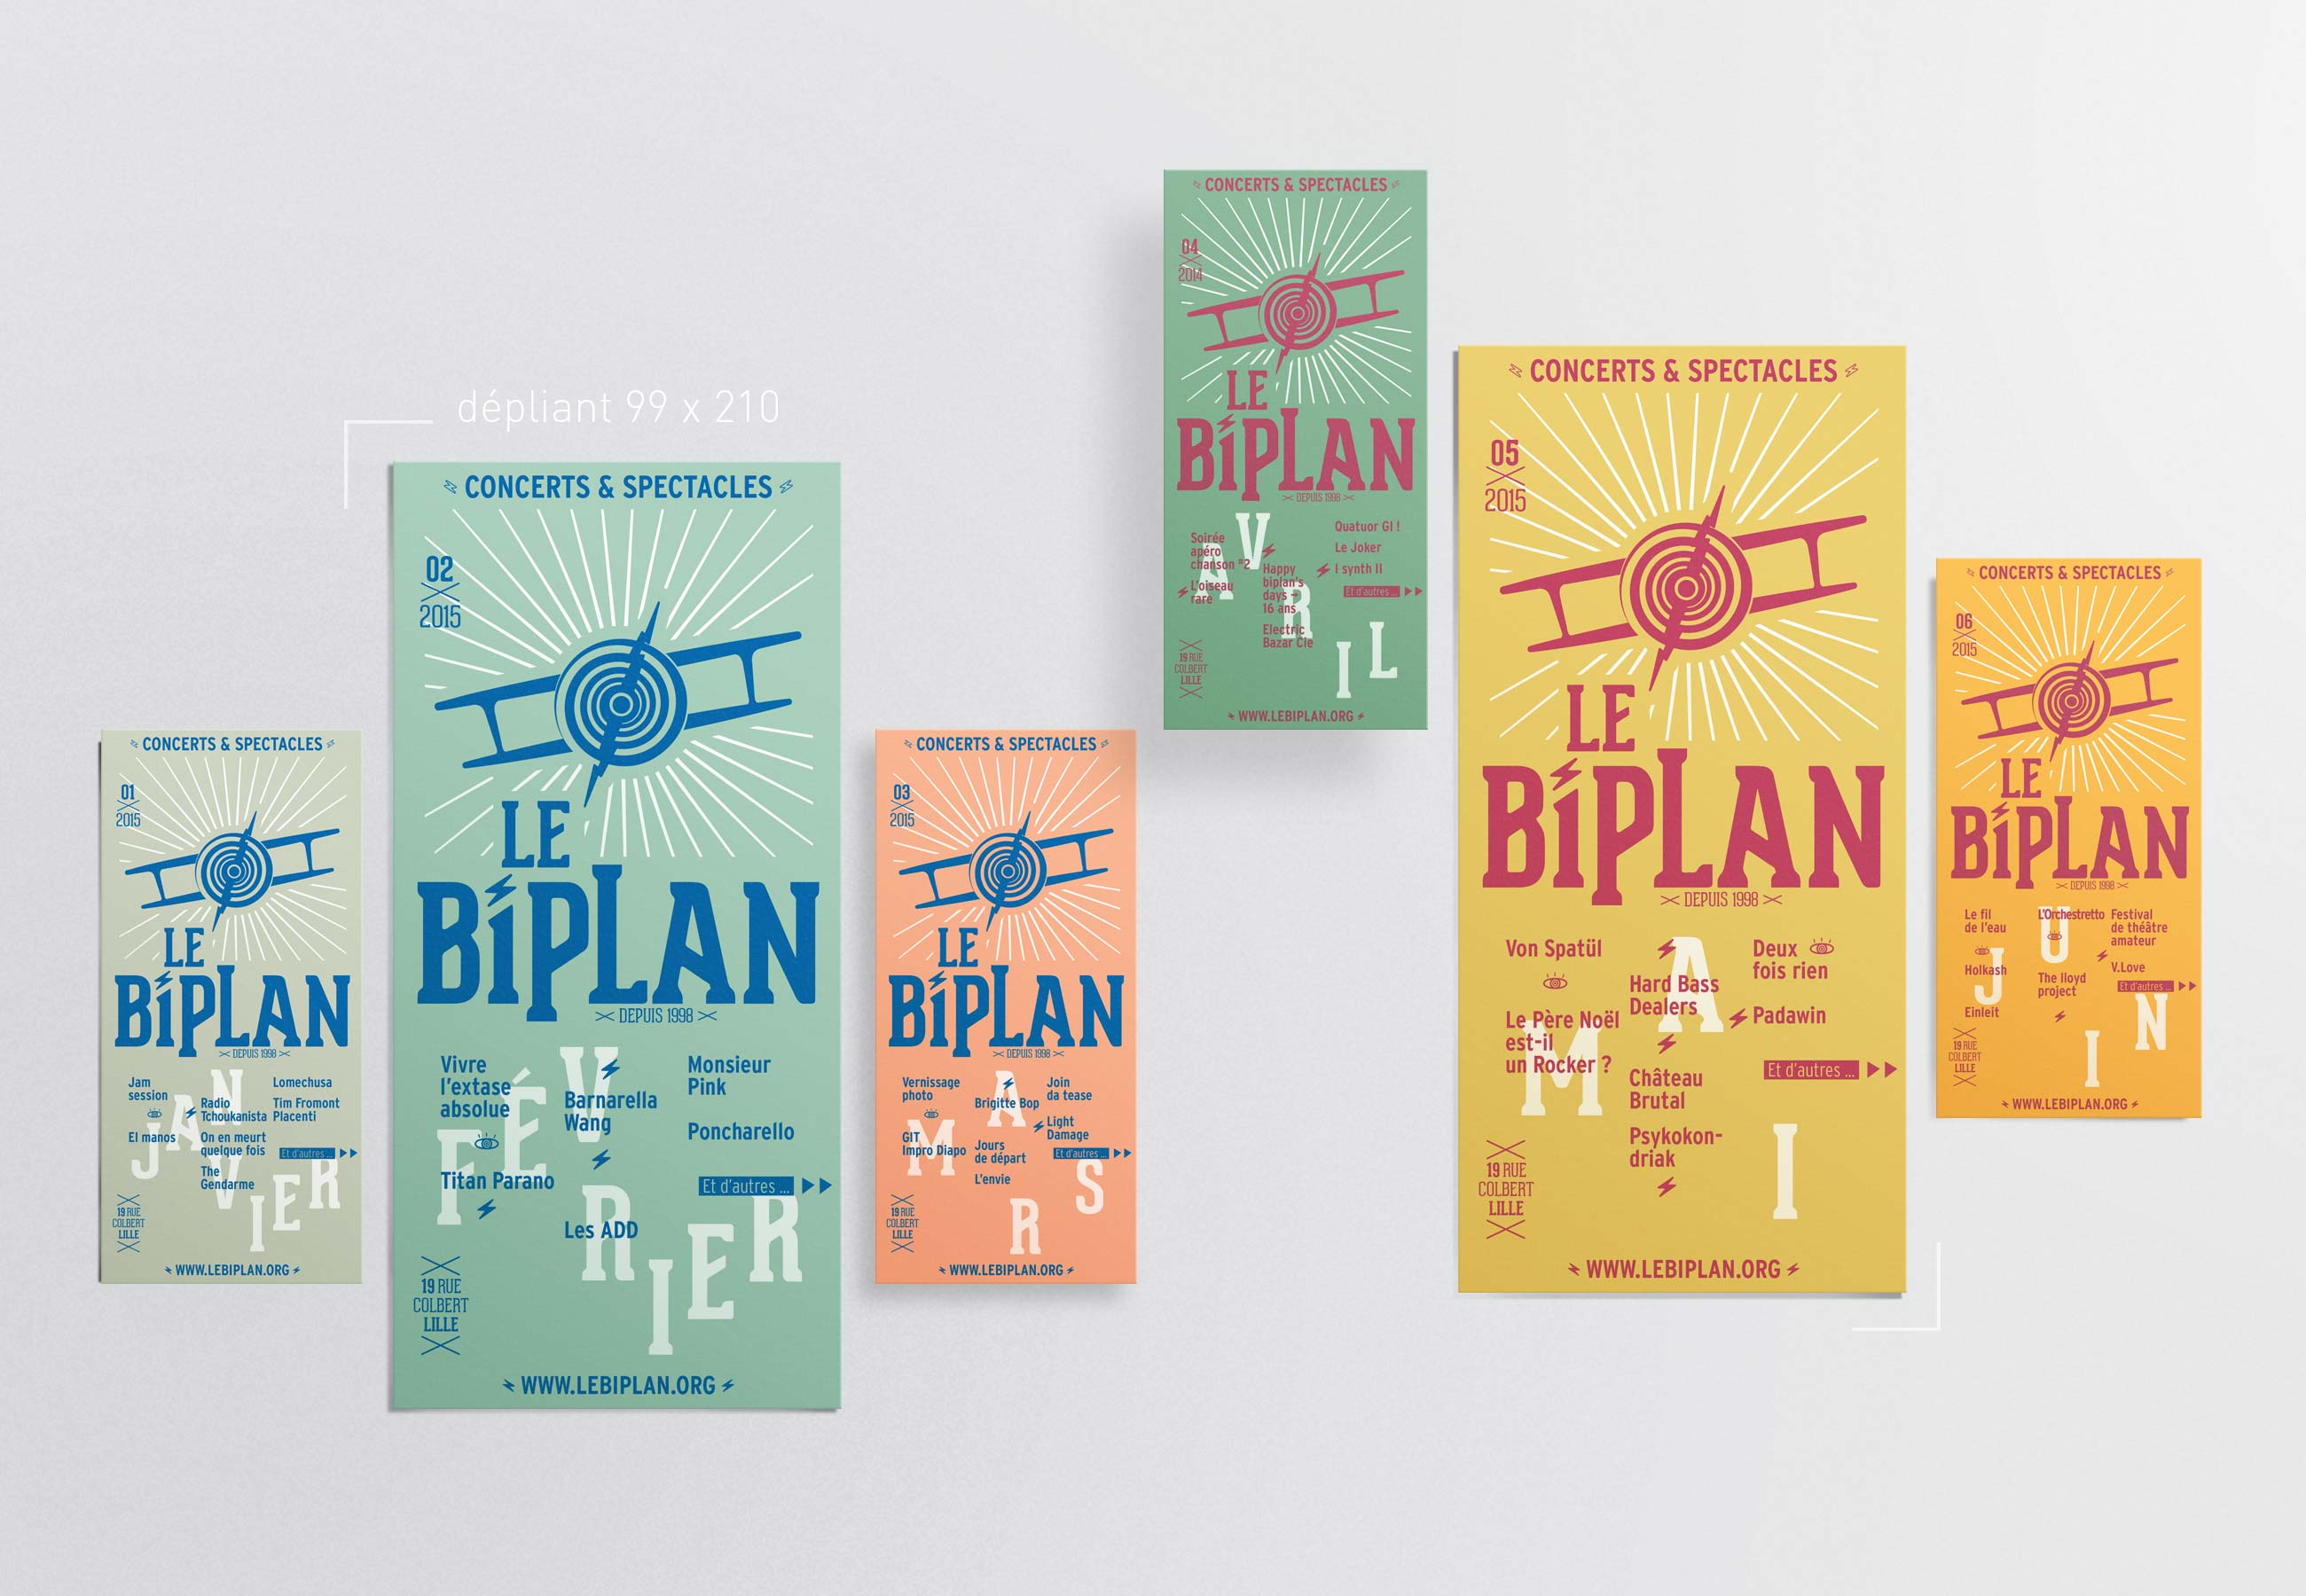 biplan_02_parallele_graphique